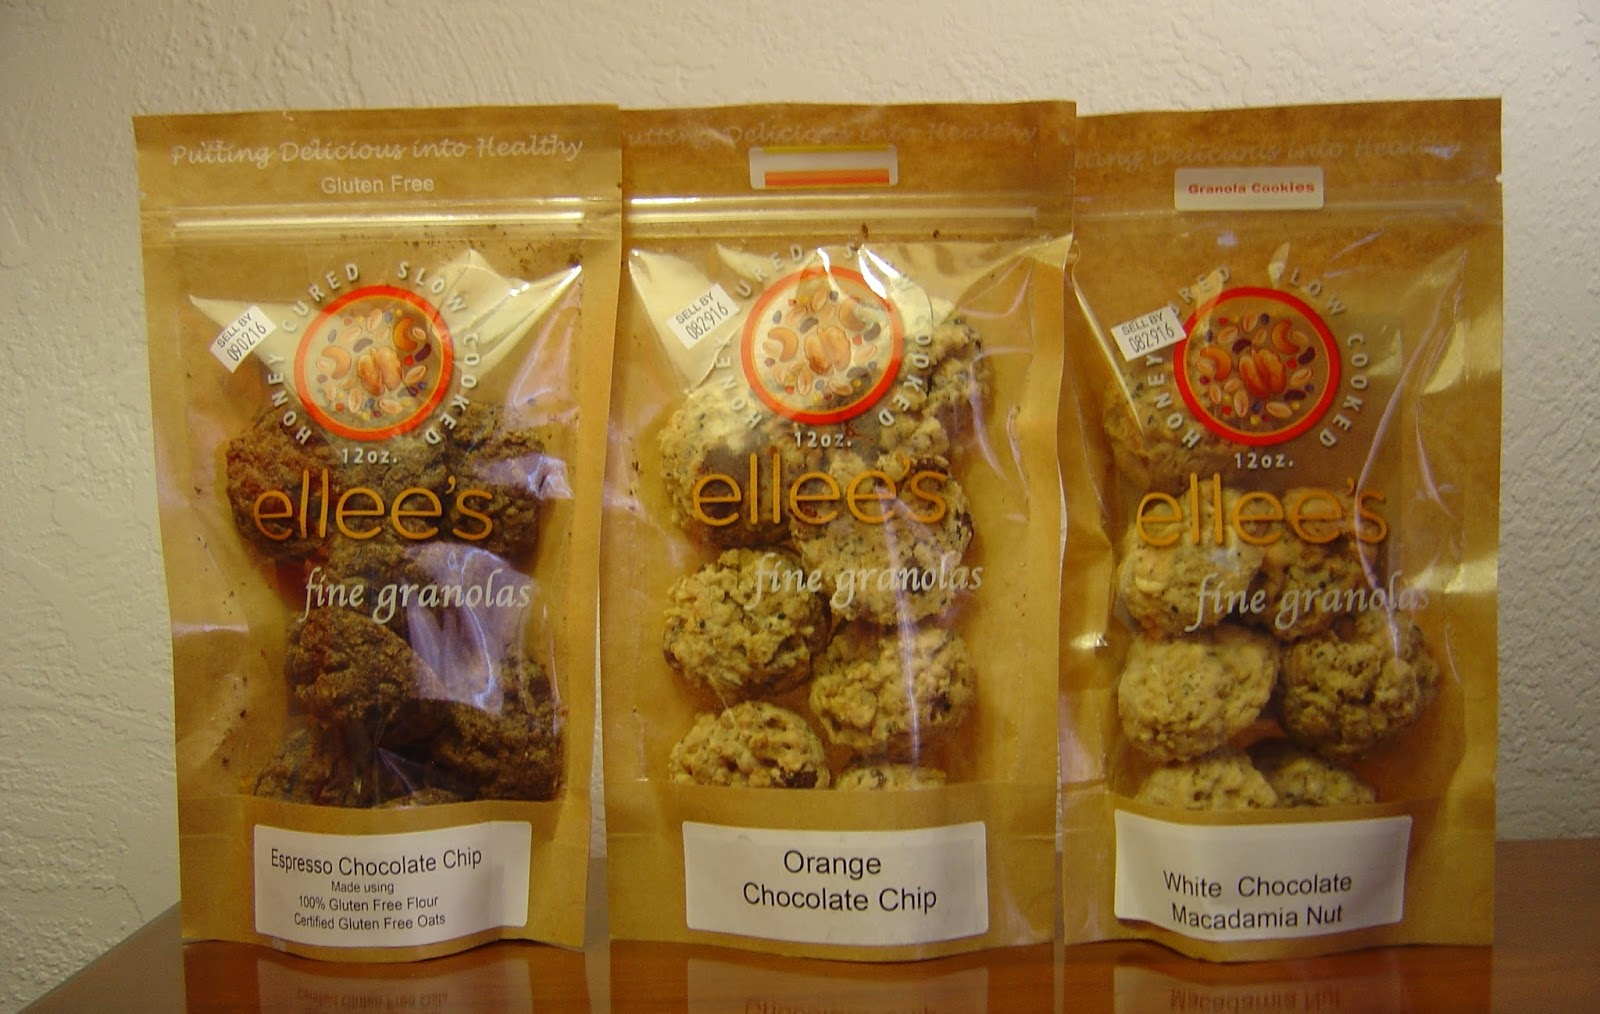 Ellee's Gourmet Granolas Espresso Chocolate Chip, Orange Chocolate Chip, and White Chocolate Macadamia Nut Granola Cookies